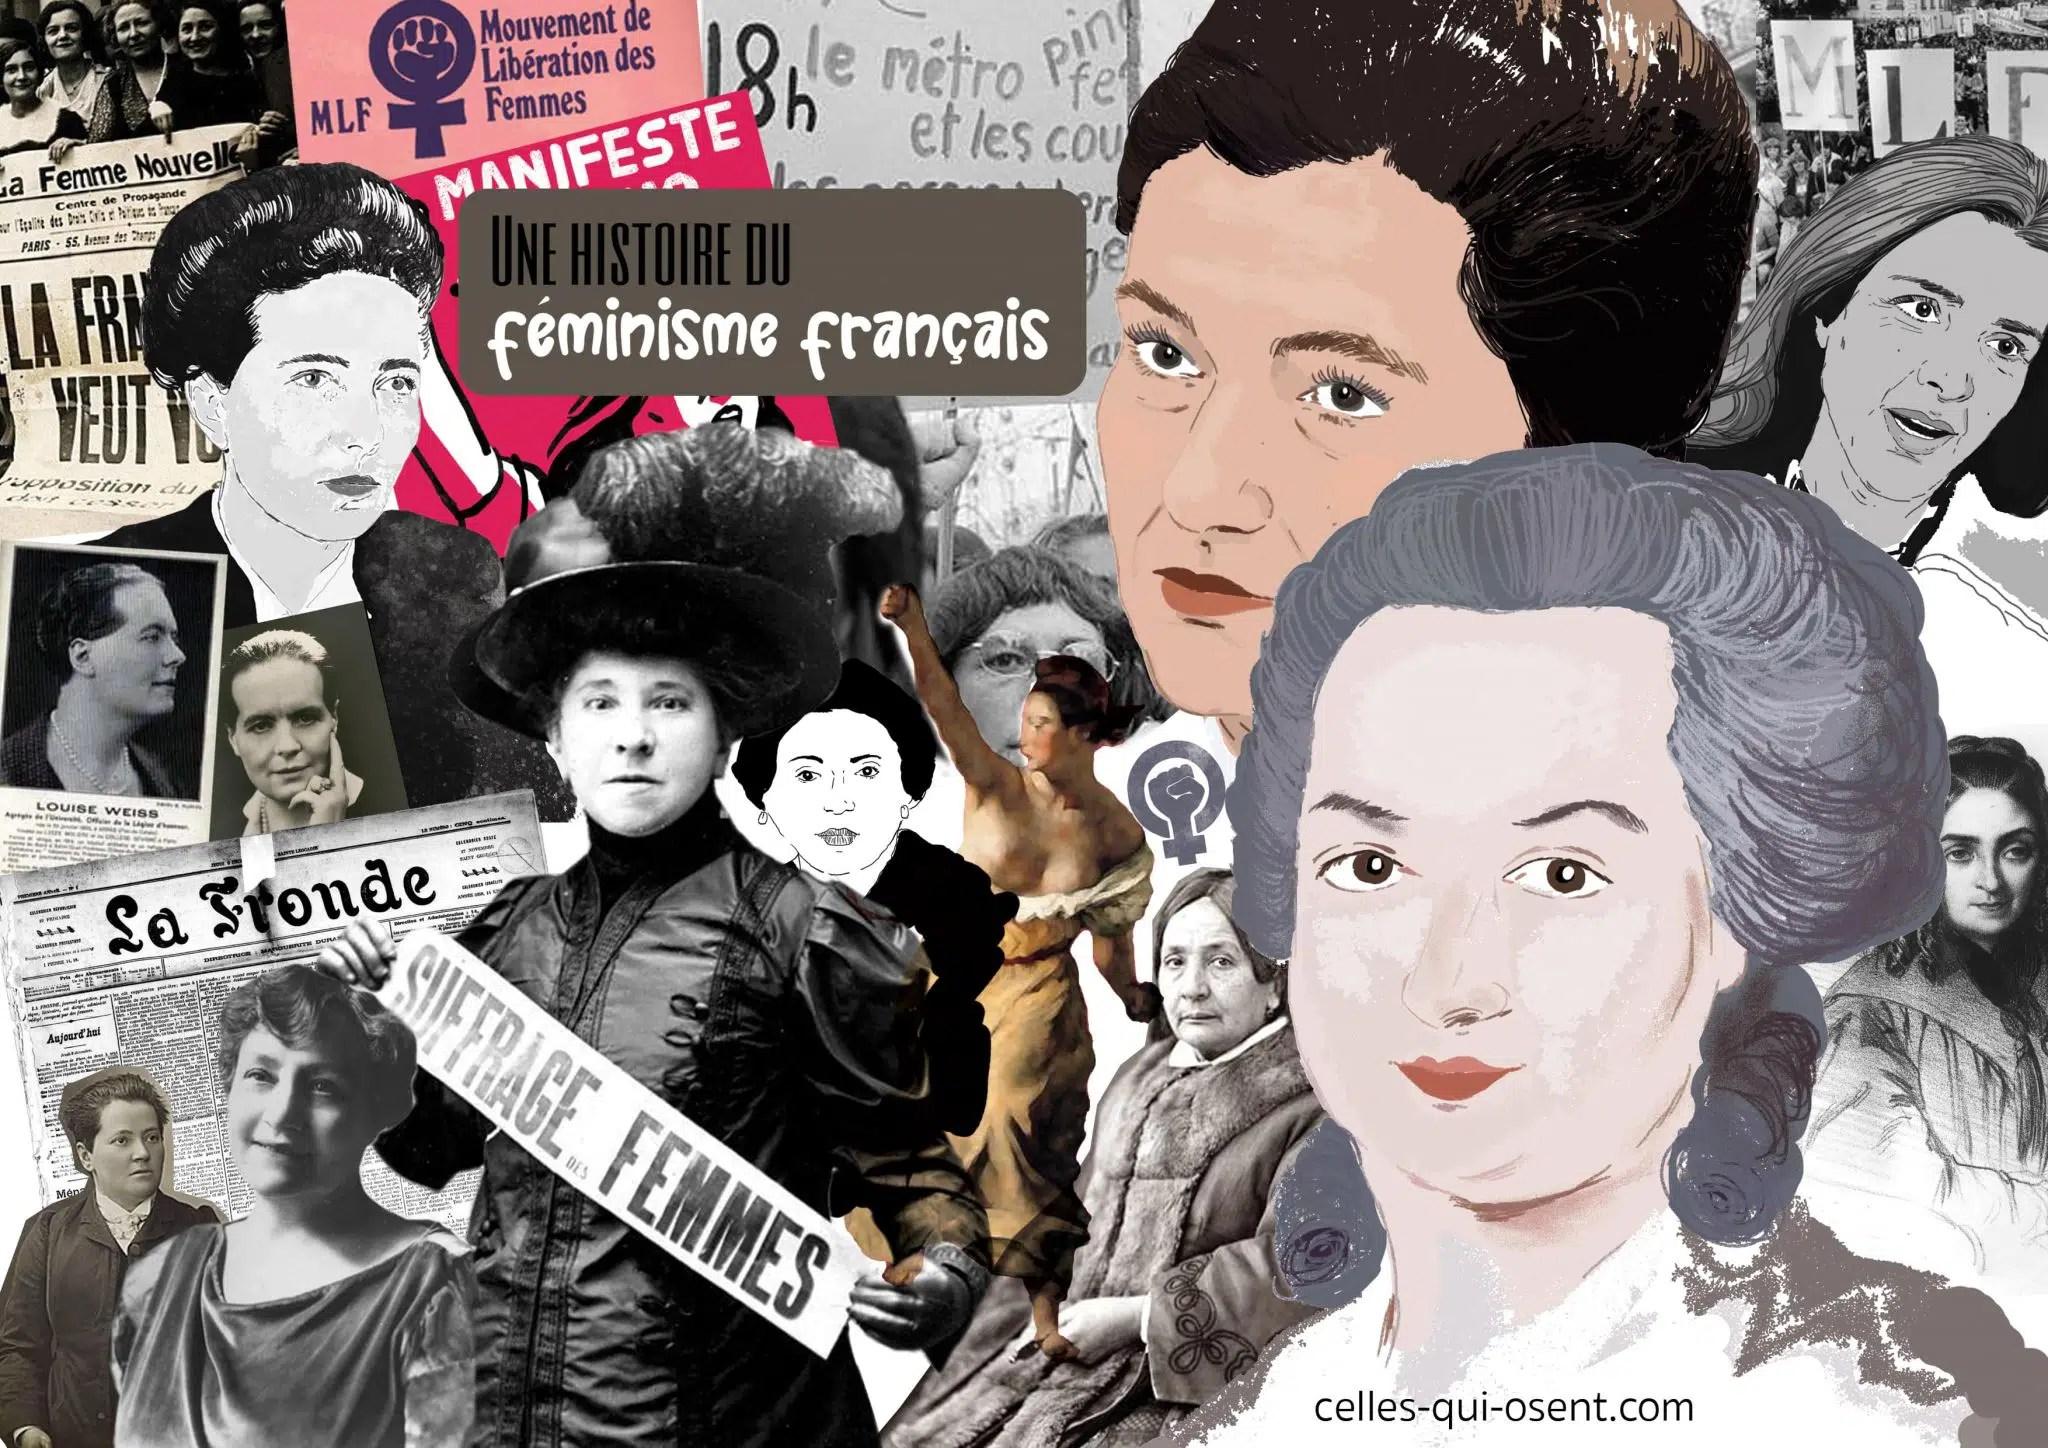 histoire-du-feminisme-celles-qui-osent